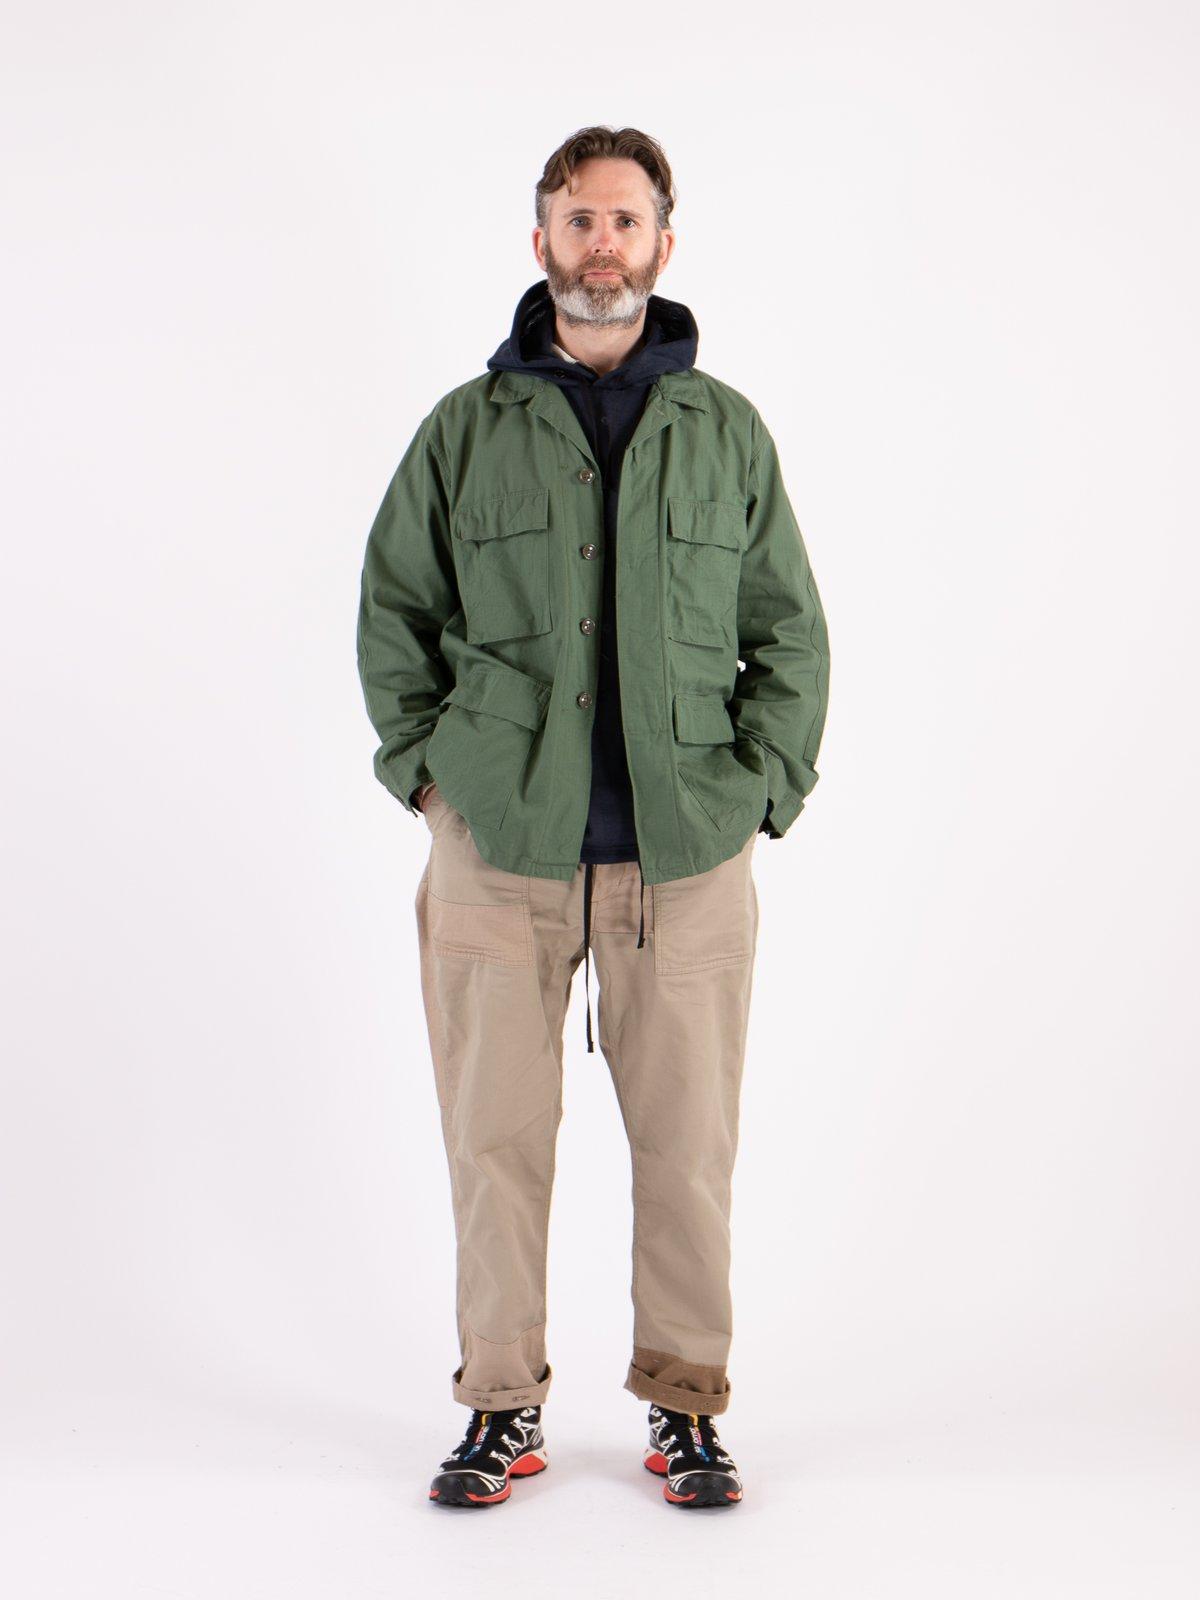 Olive Cotton Ripstop BDU Jacket - Image 2